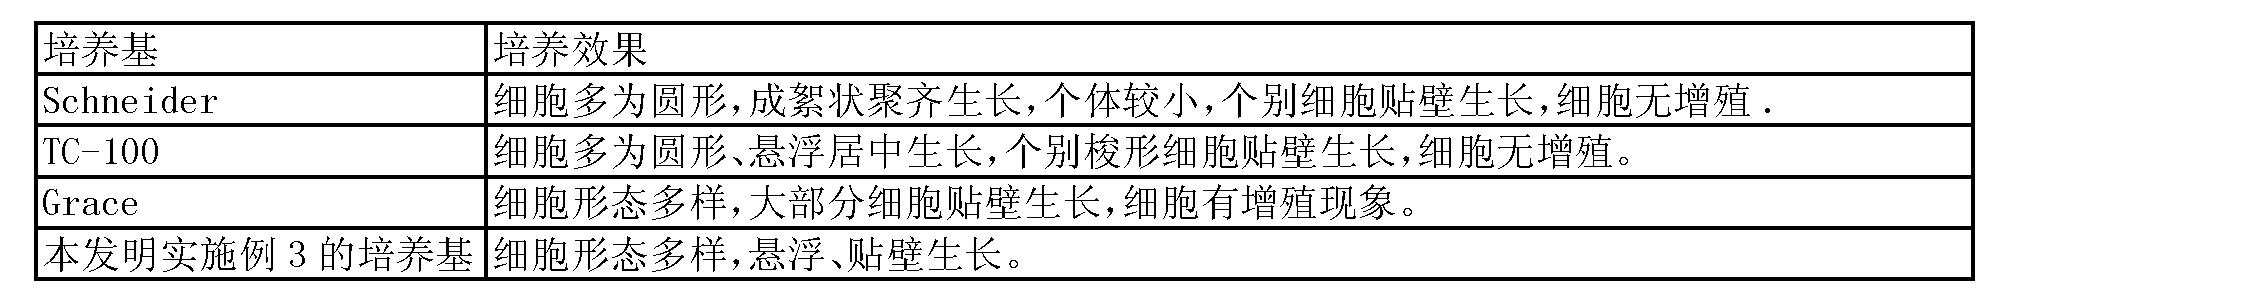 Figure CN102776148AD00121